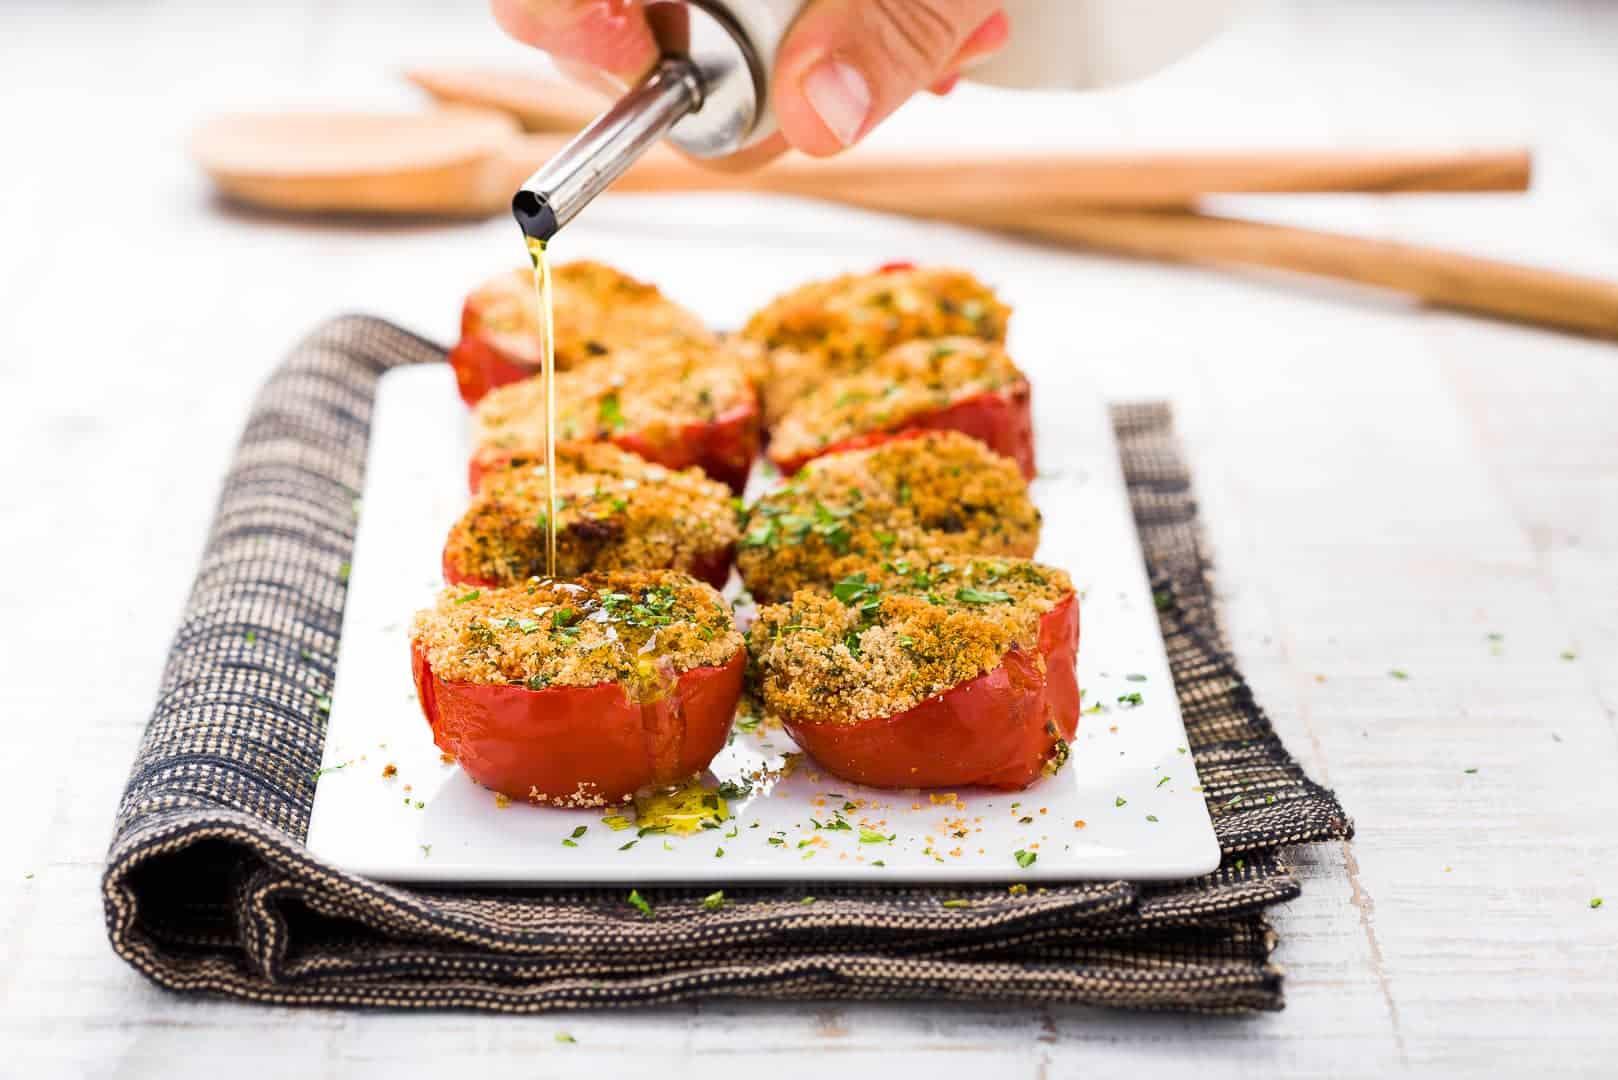 Pomodori al forno Ricetta marchigiana GnamaAm.com Hero